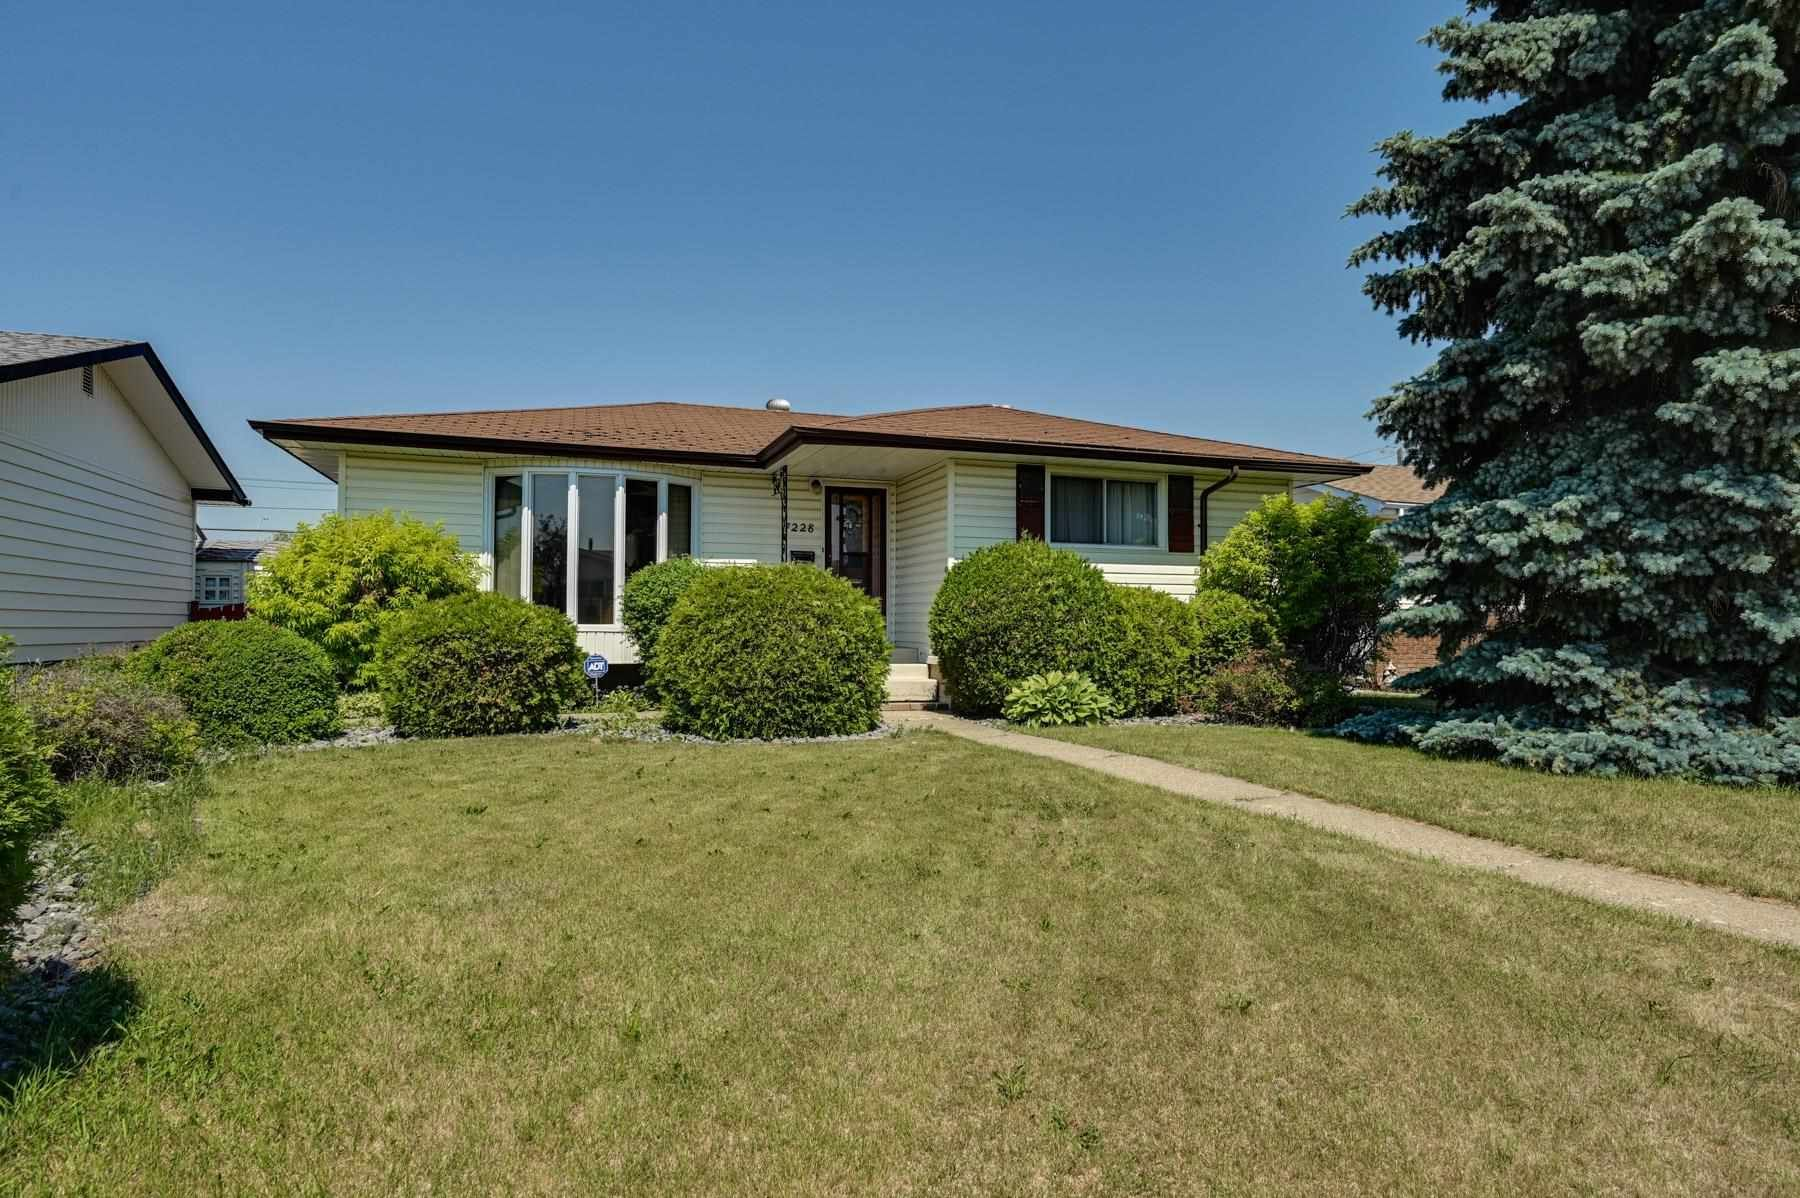 Main Photo: 7228 131A Avenue in Edmonton: Zone 02 House for sale : MLS®# E4252234